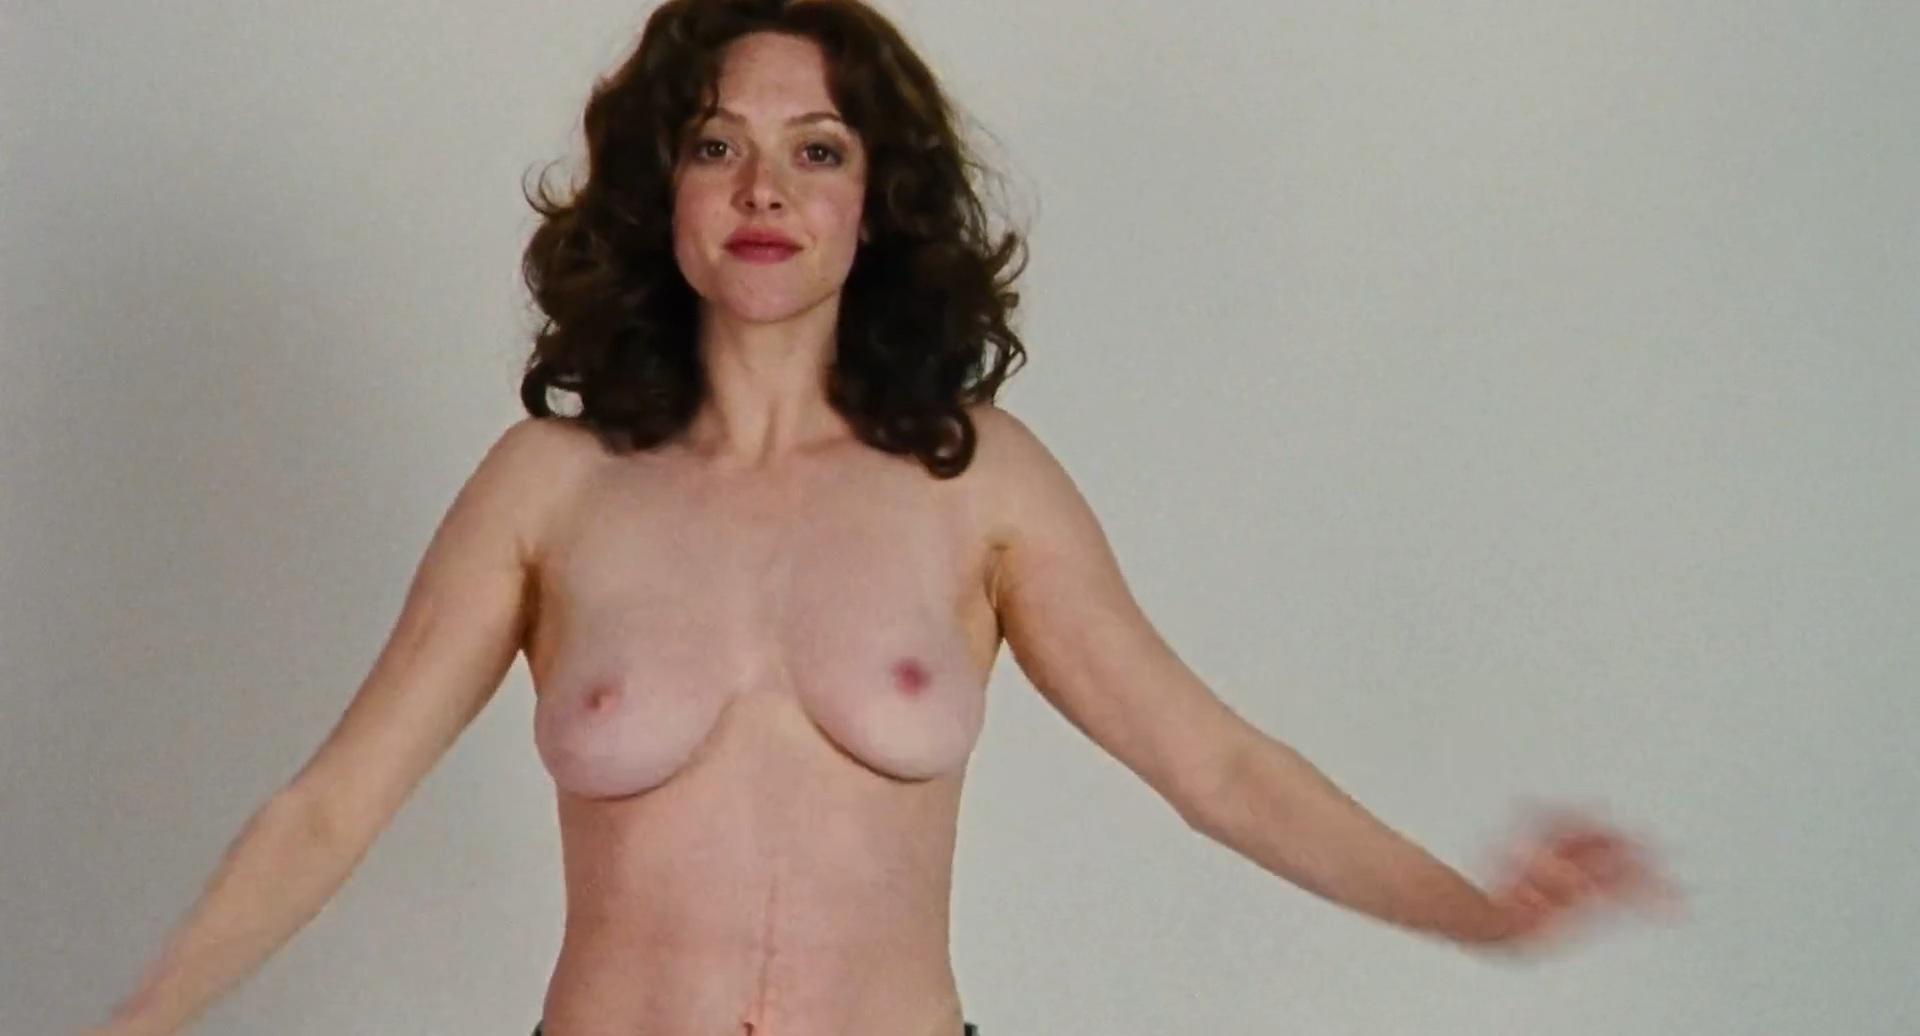 Amanda Seyfried sin ropa interior 1